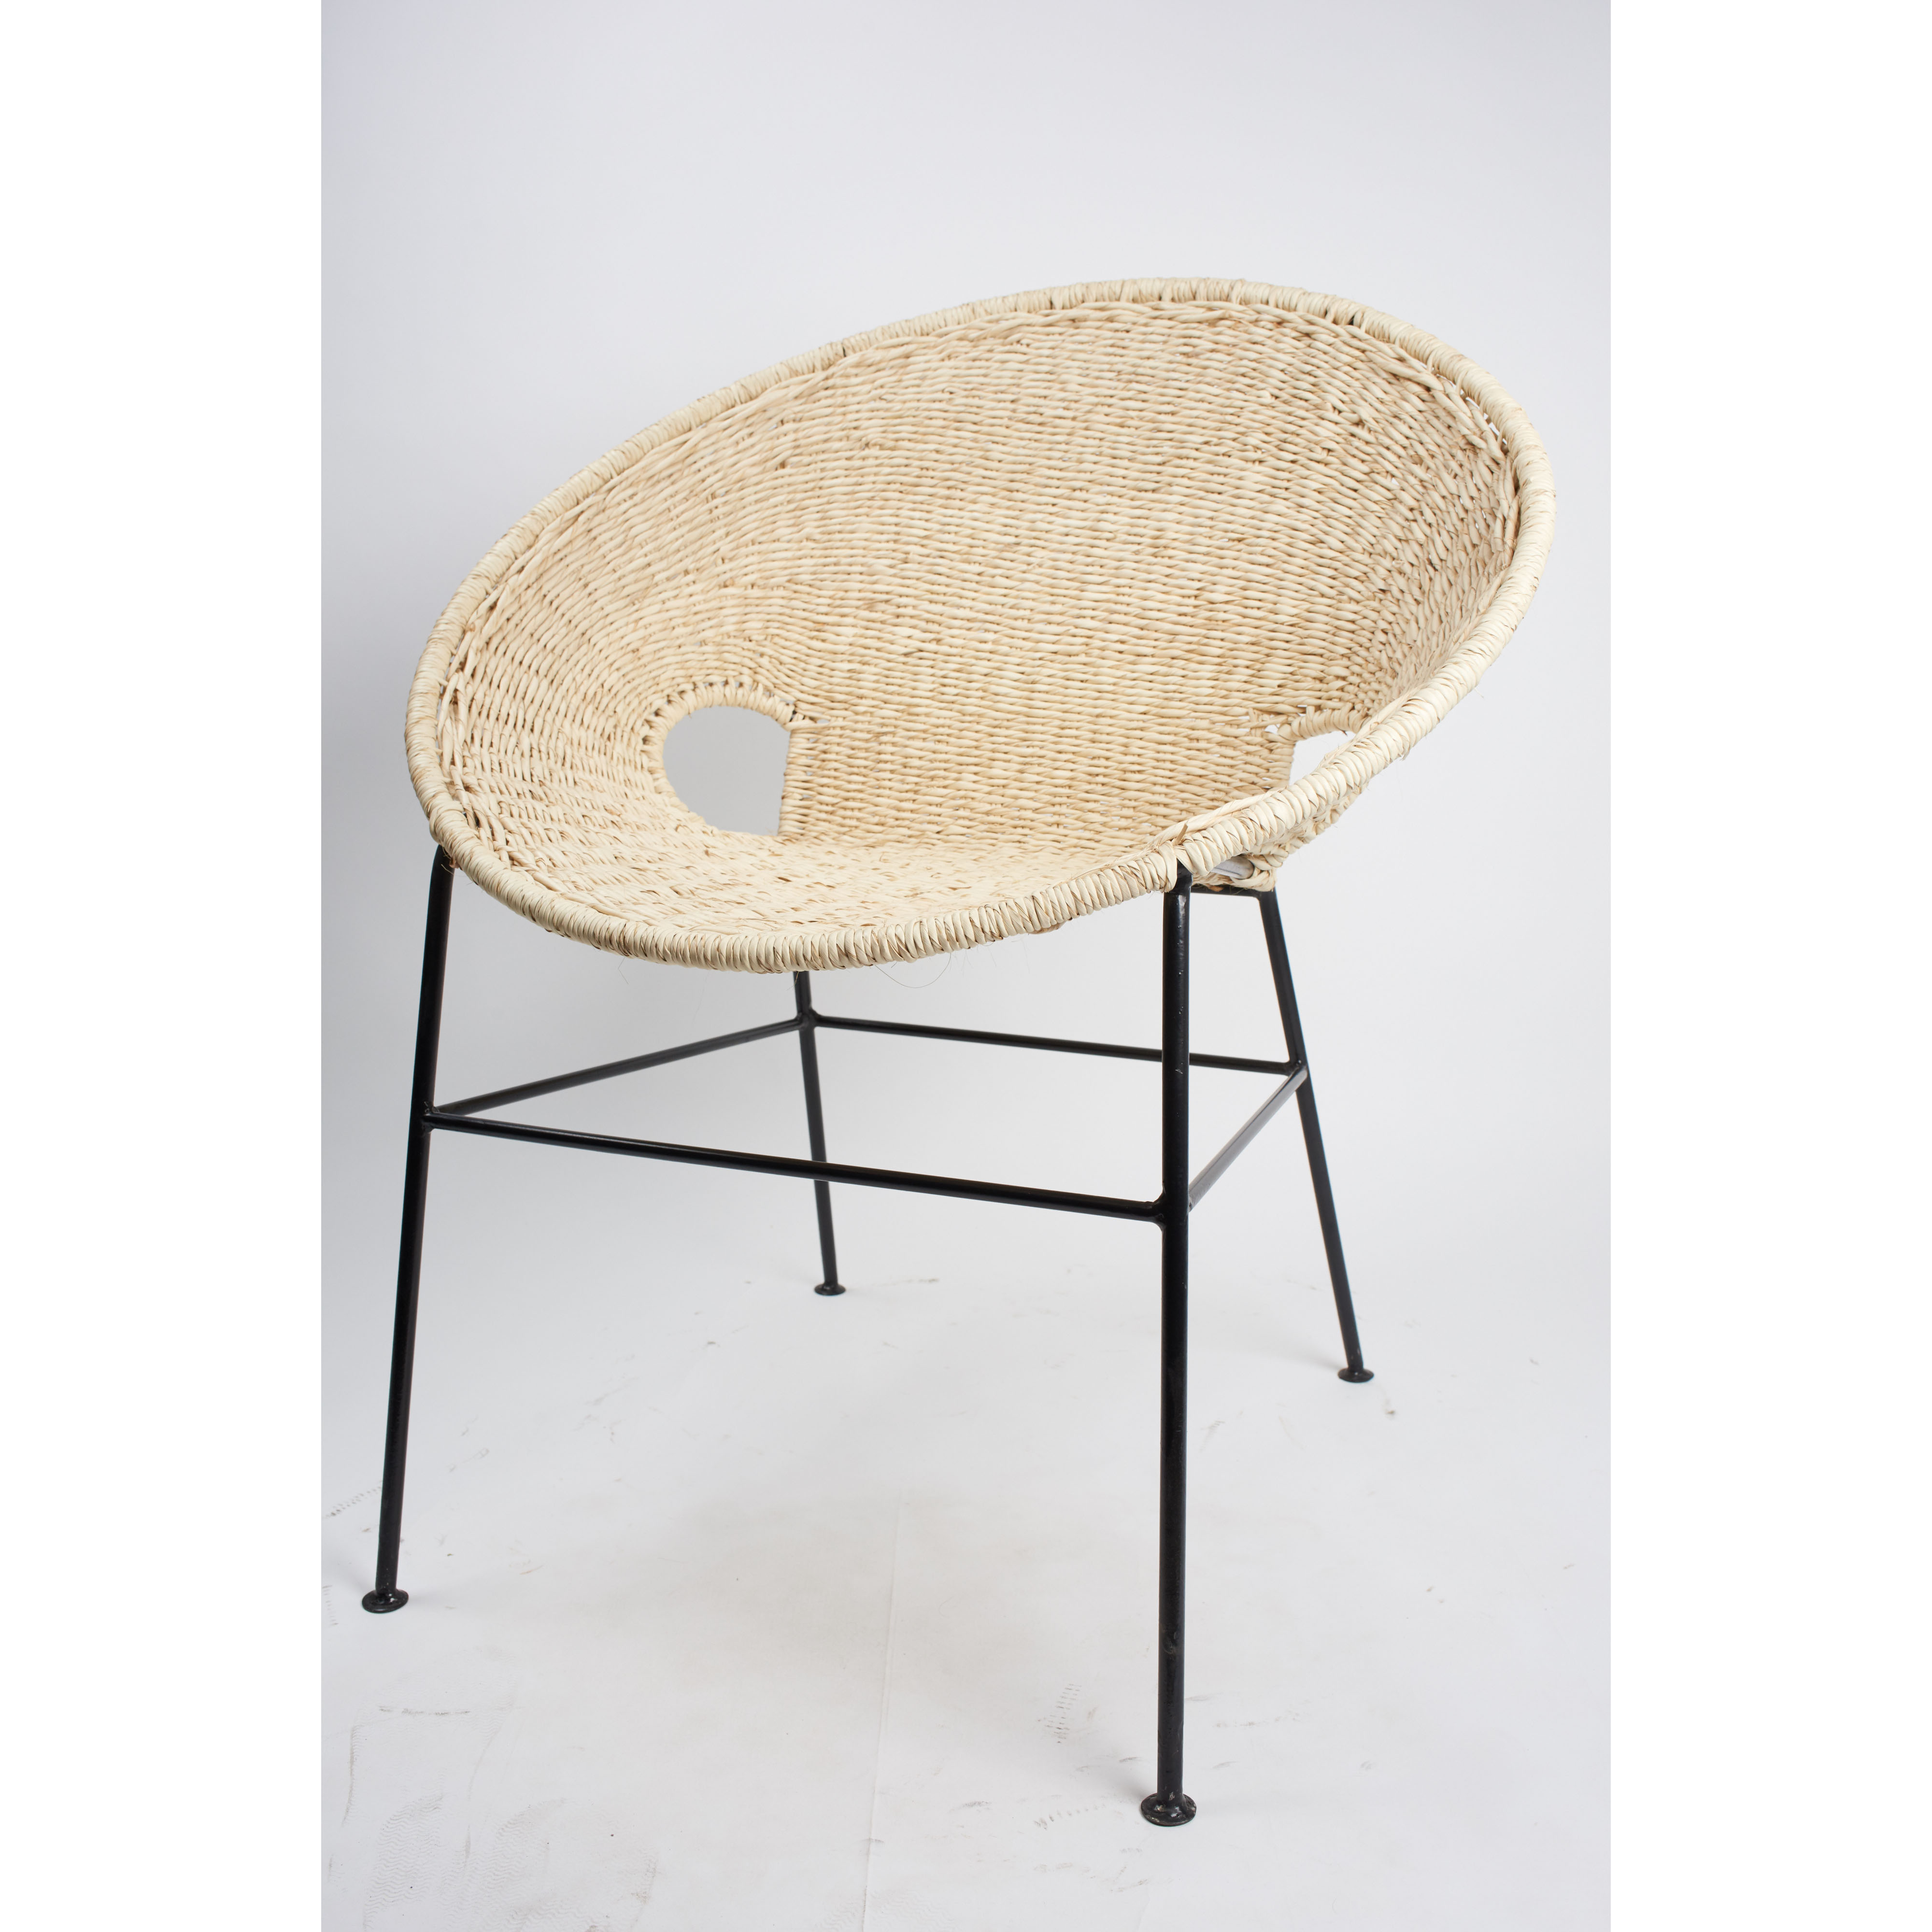 Silla restaurante bow palma grupo meta soluciones de for Muebles de oficina roldan palma